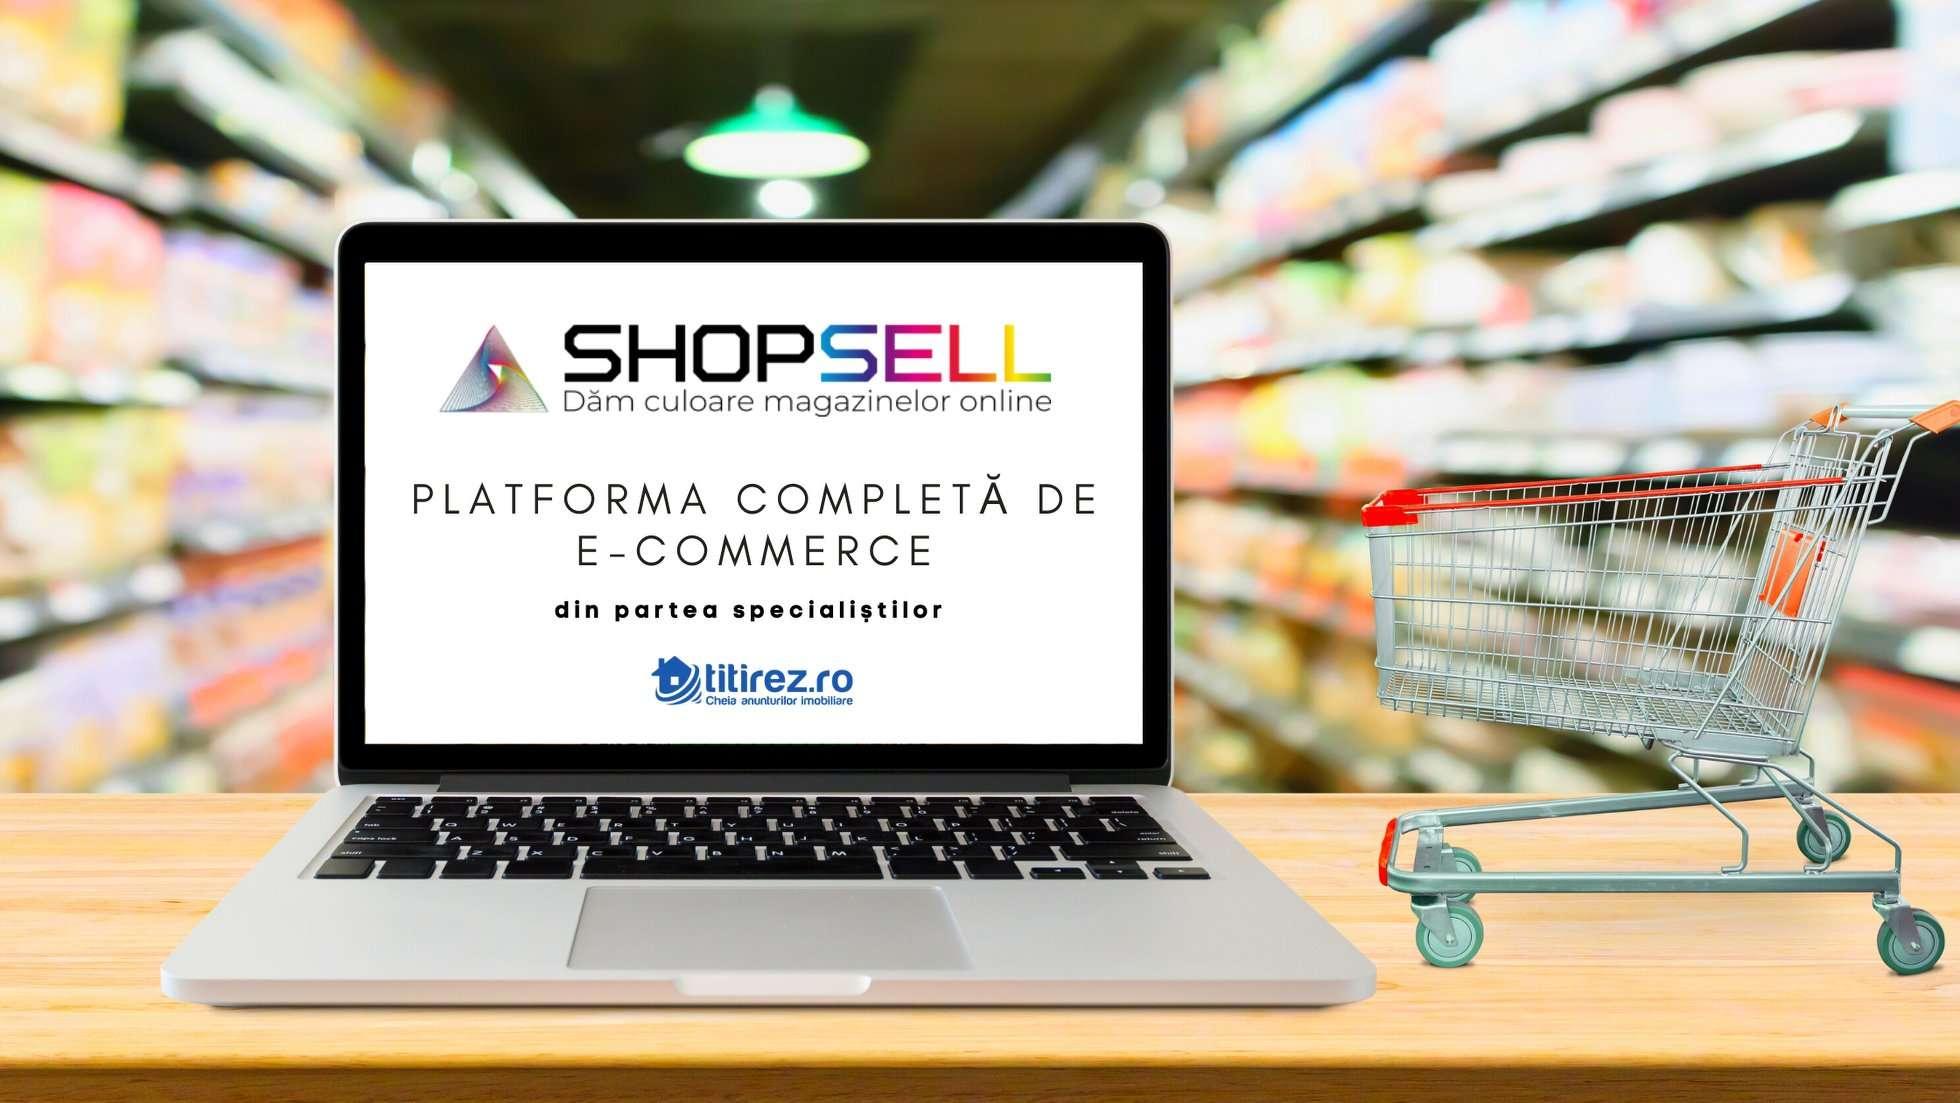 Lansare Shopsell - Magazin online fara batai de cap! Afla cum poti sa VINZI repede si simplu